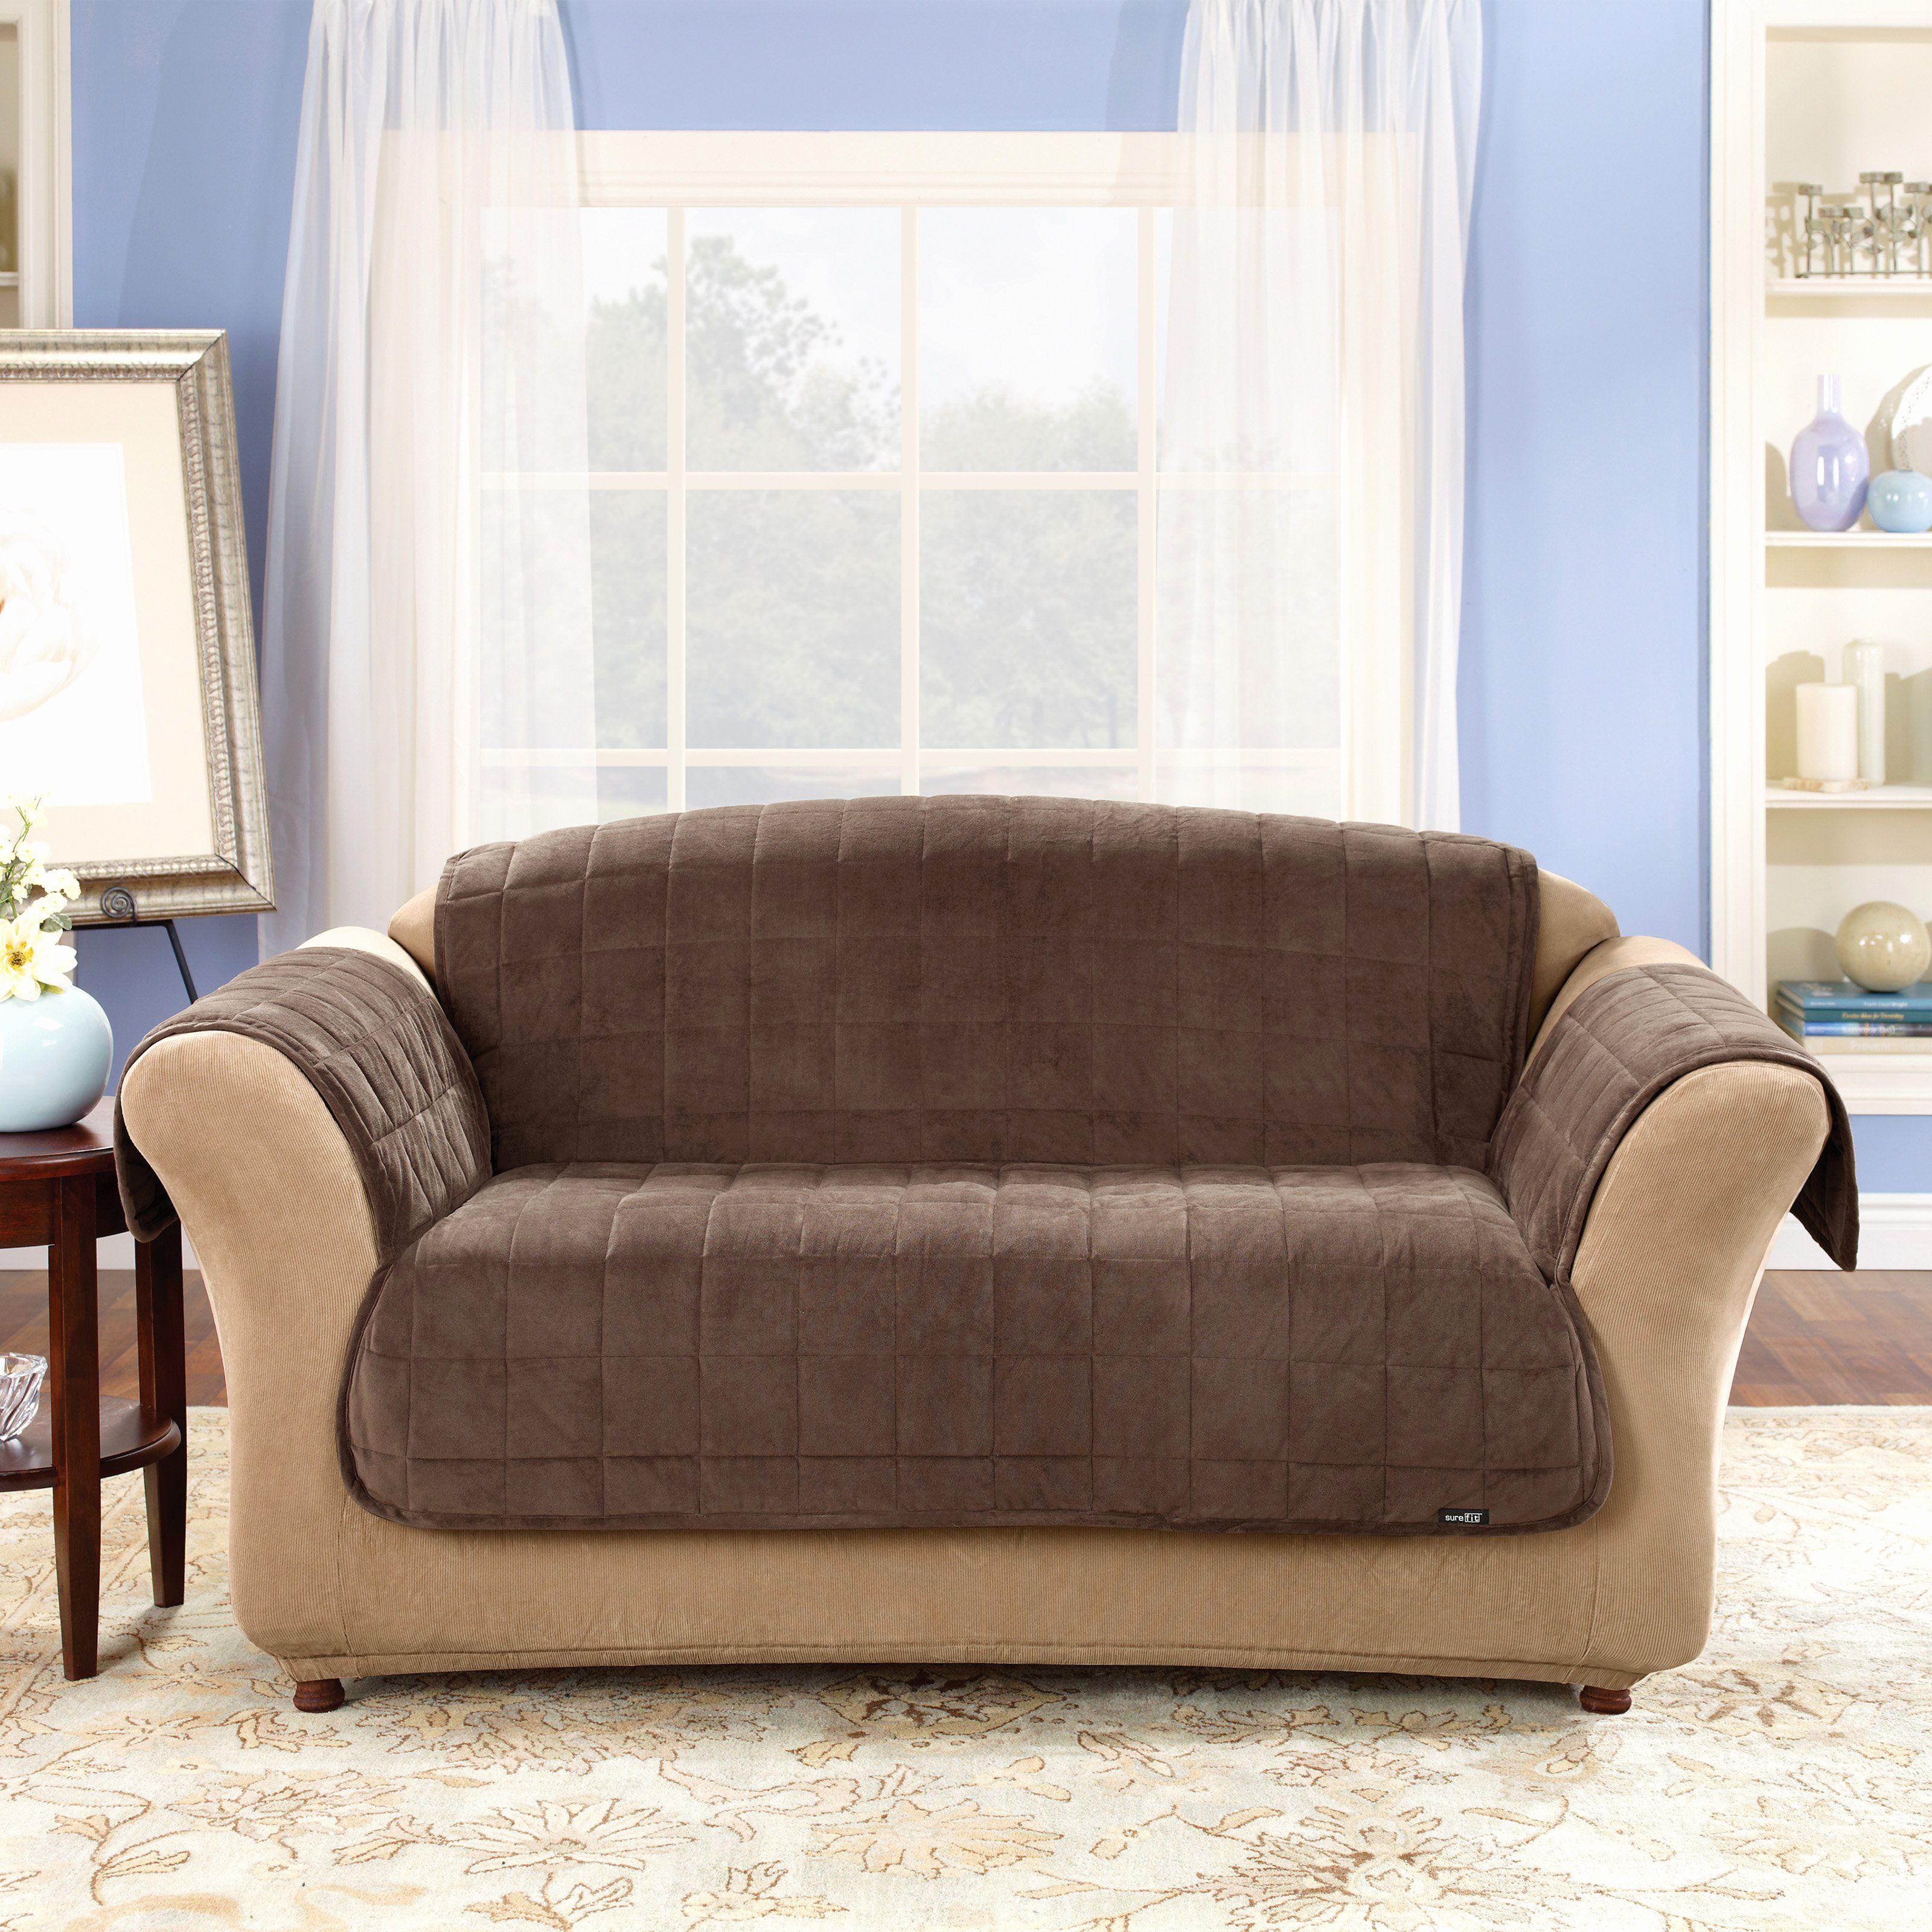 Idea black sofa cover image black sofa cover beautiful surefit stretch pinstripe piece t cushion sofa slipcover black